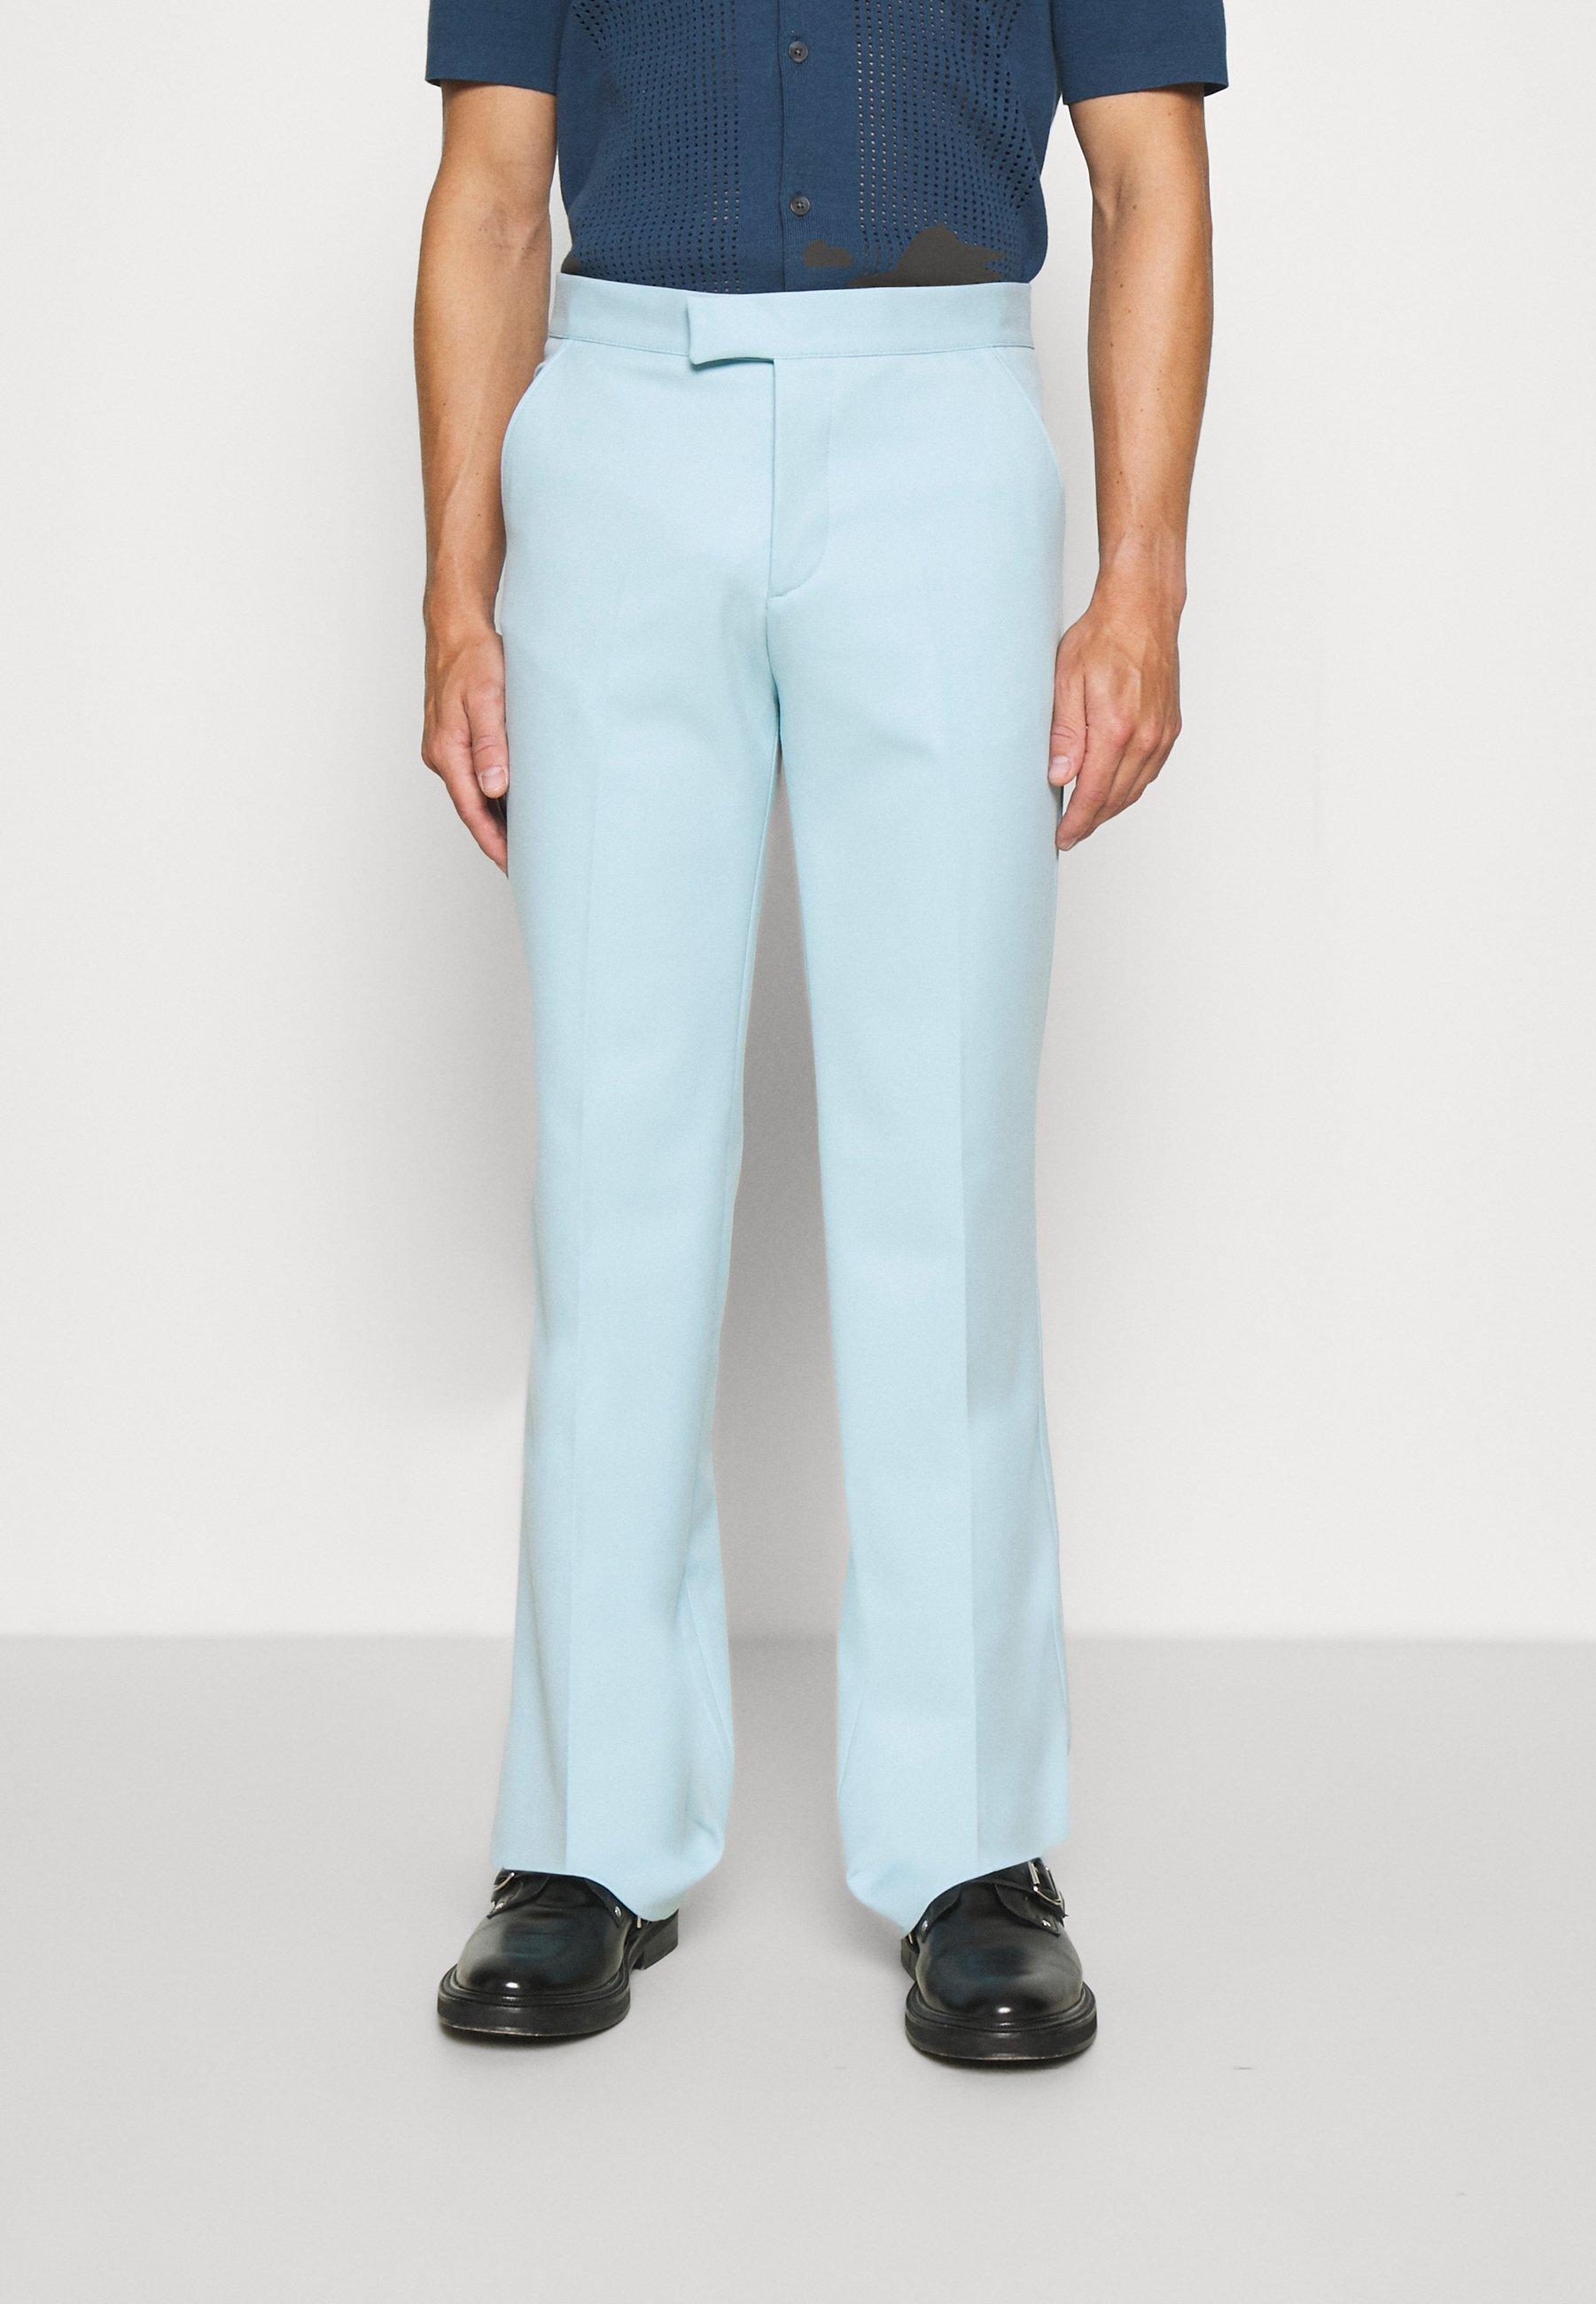 Uomo CALEB TROUSERS - Pantaloni